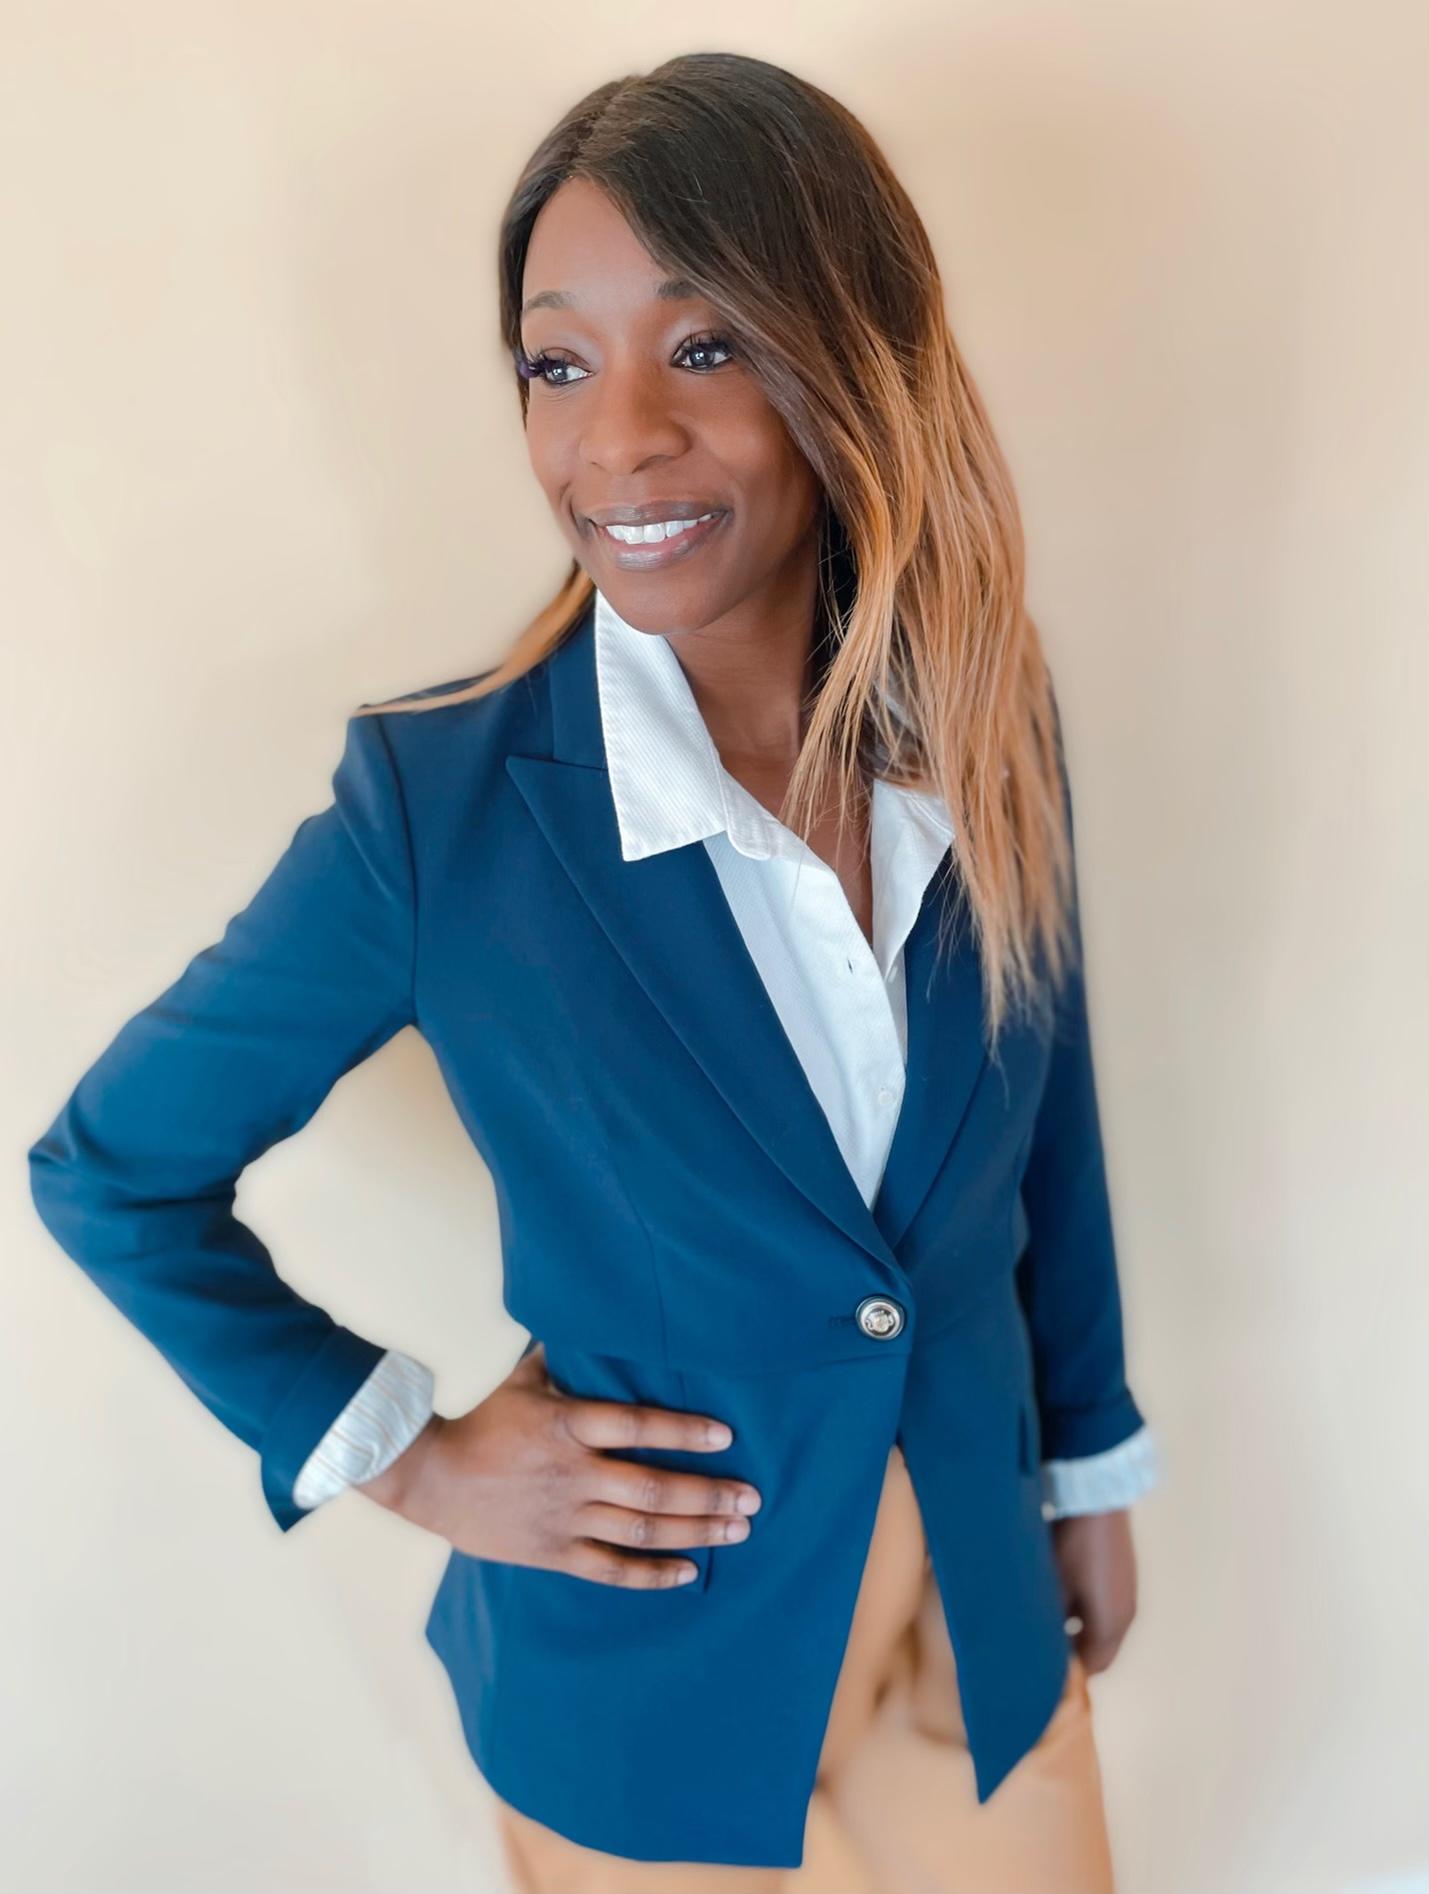 Healing From Postpartum Depression w/Business Exec Elizabeth Lascaze